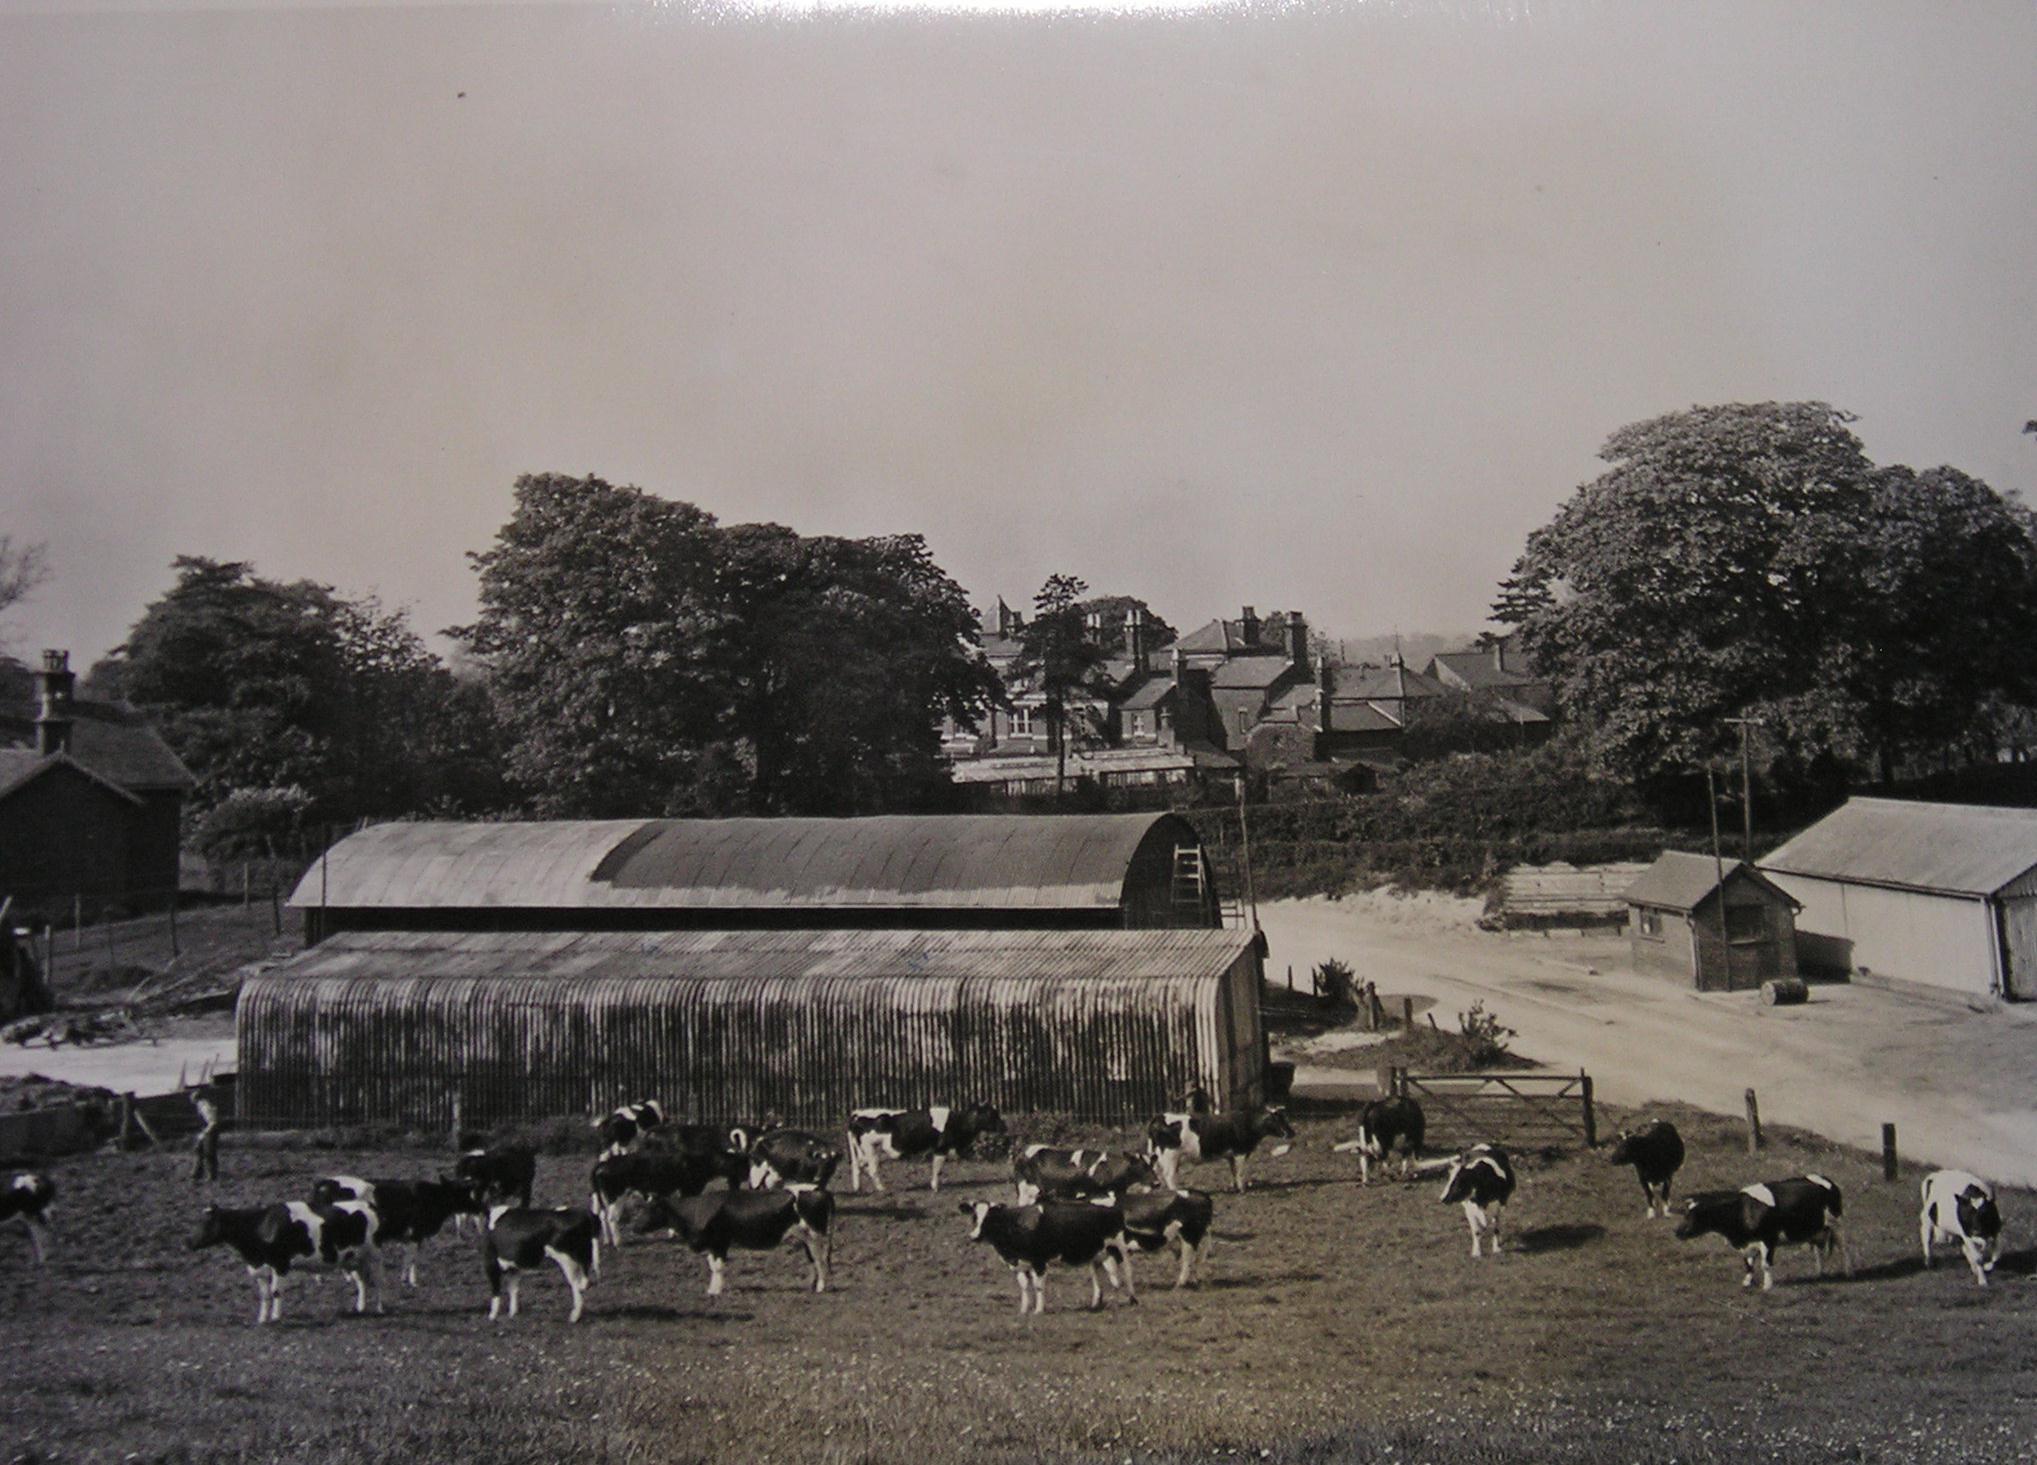 Sheards Cattle on the original farm land at Astbury Mere.